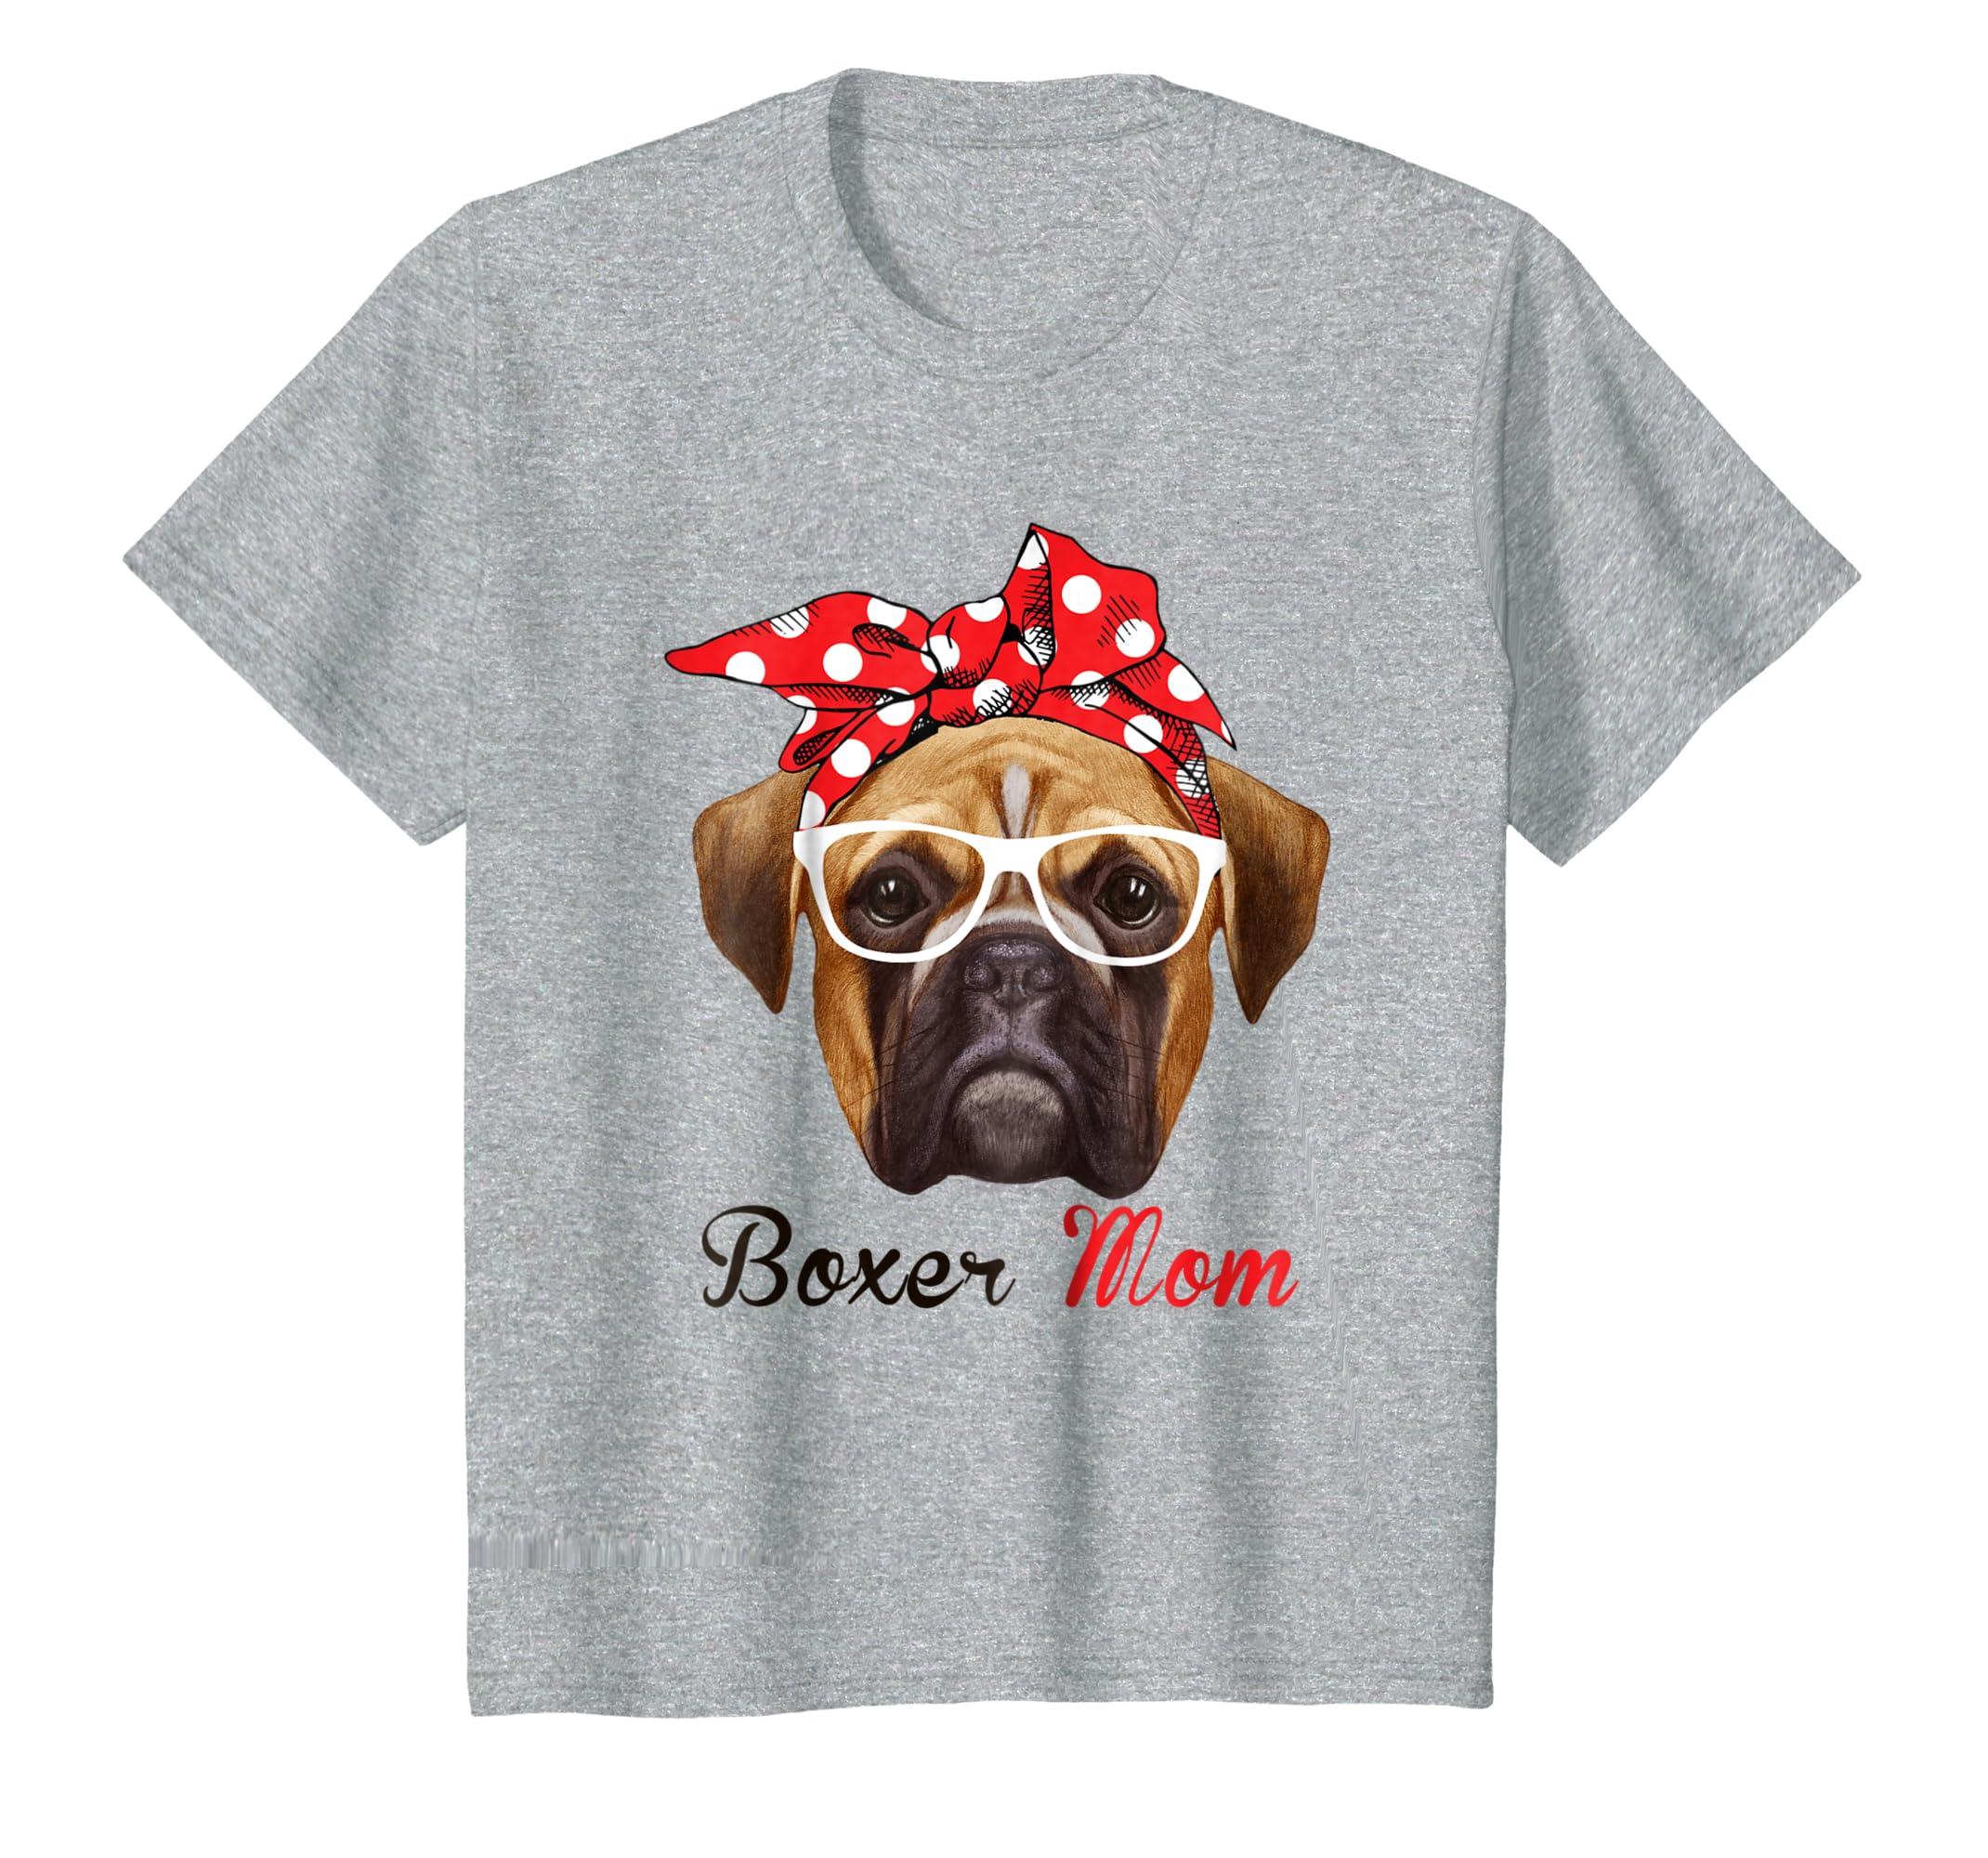 Amazon.com: Funny Boxer Mom Shirt for Women Men Boxer Dogs Lovers ...